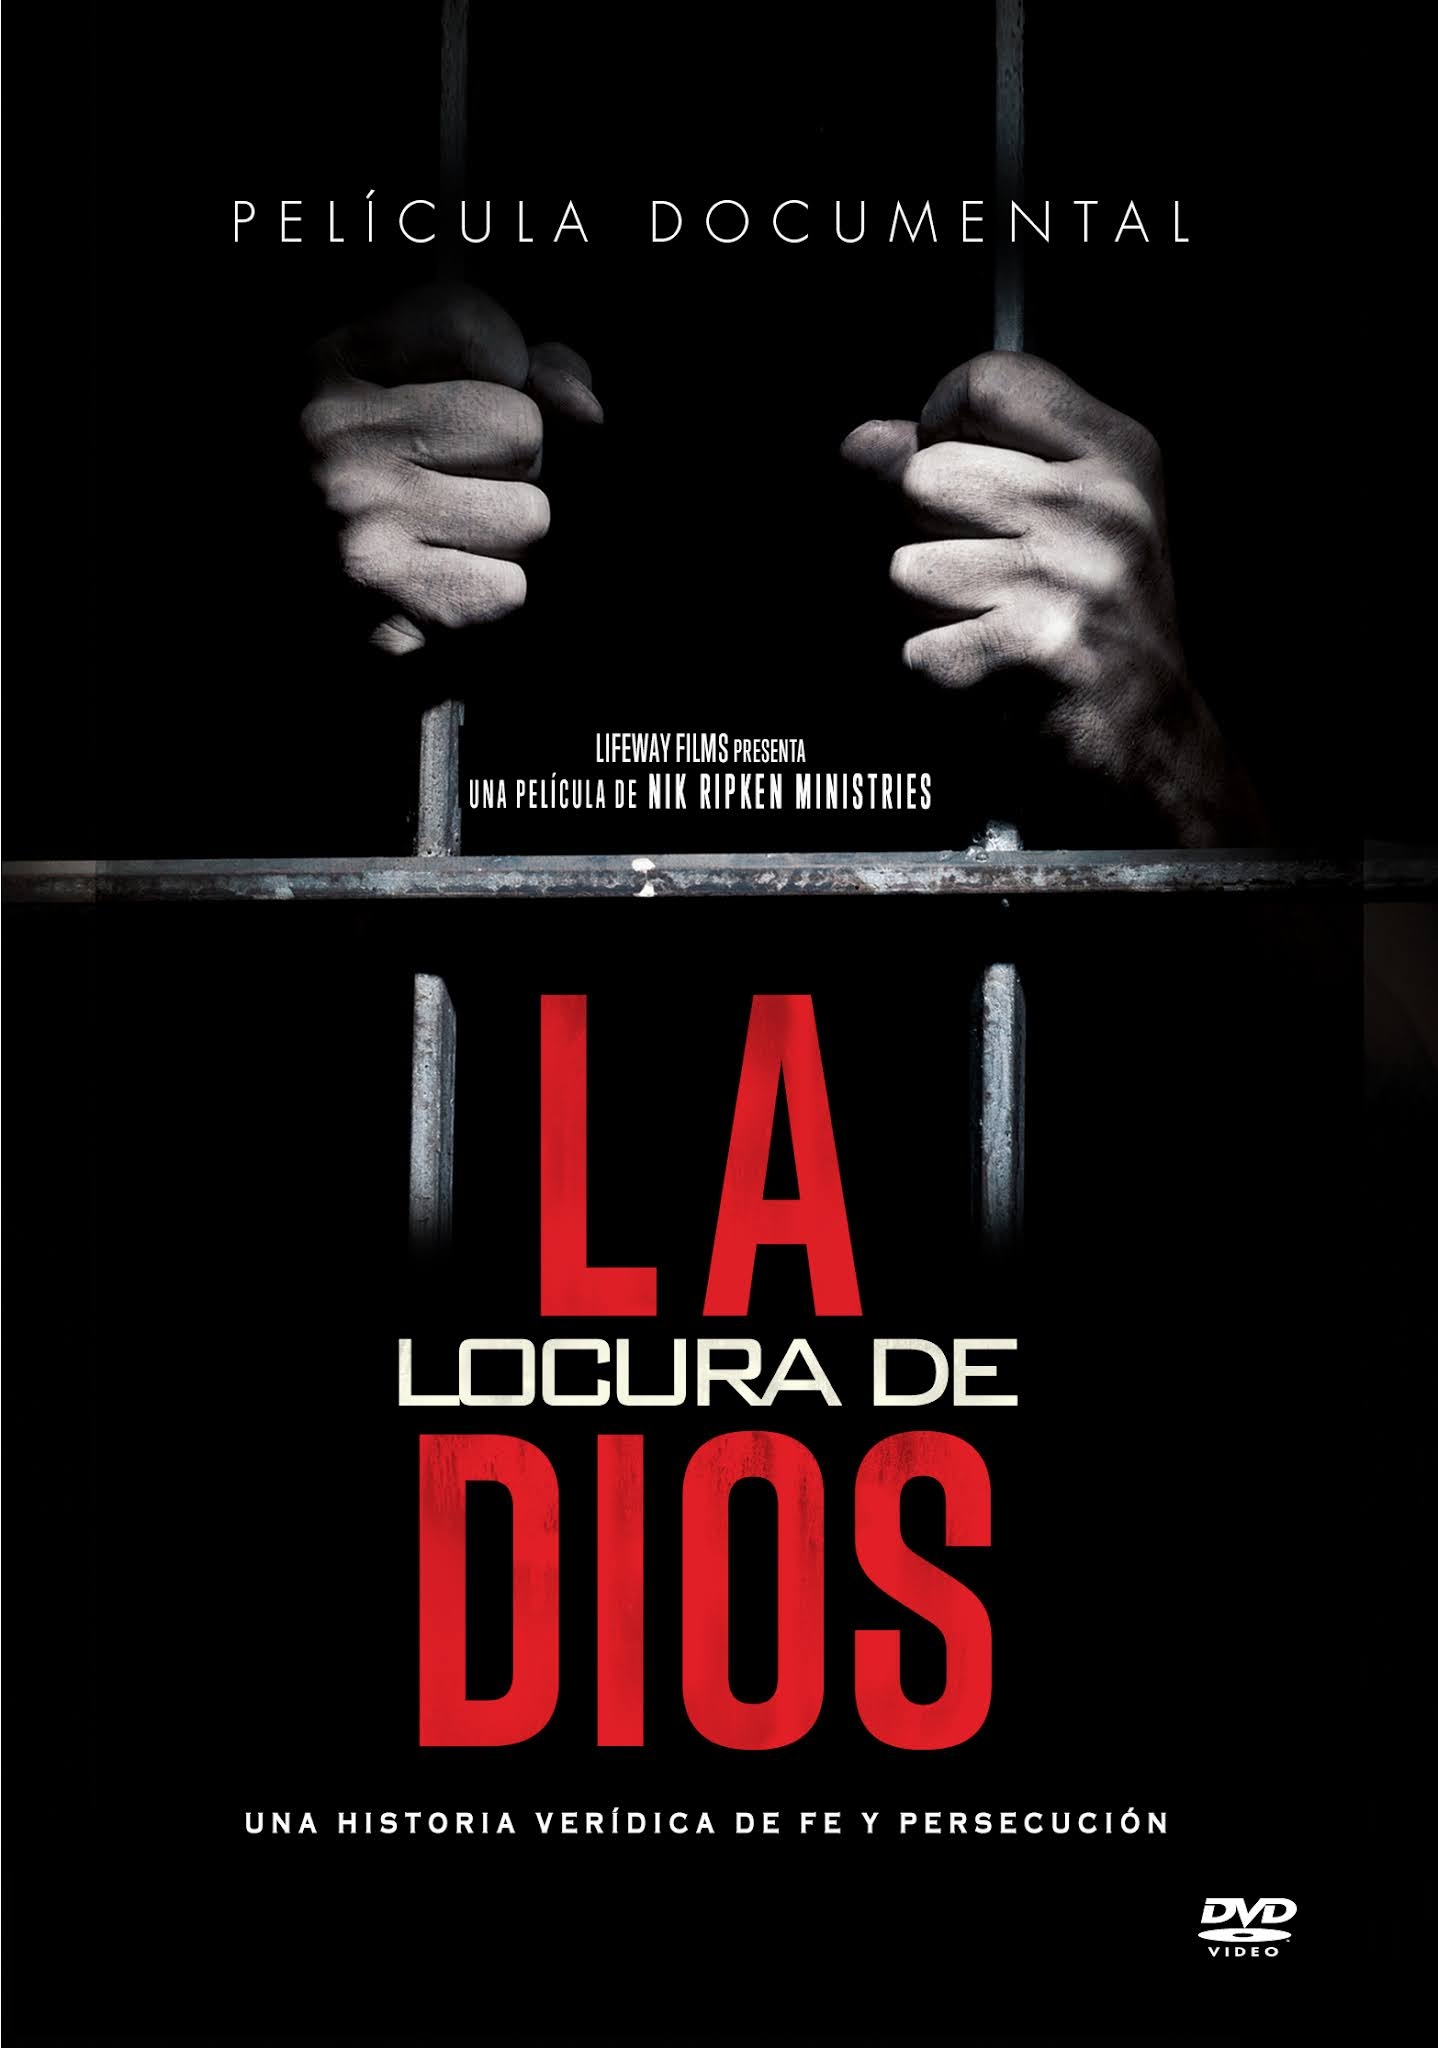 La Locura de Dios 1080P HD MP4 ESPAÑOL LATINO 2019 (Documental Cristiano) By WChristian 2021